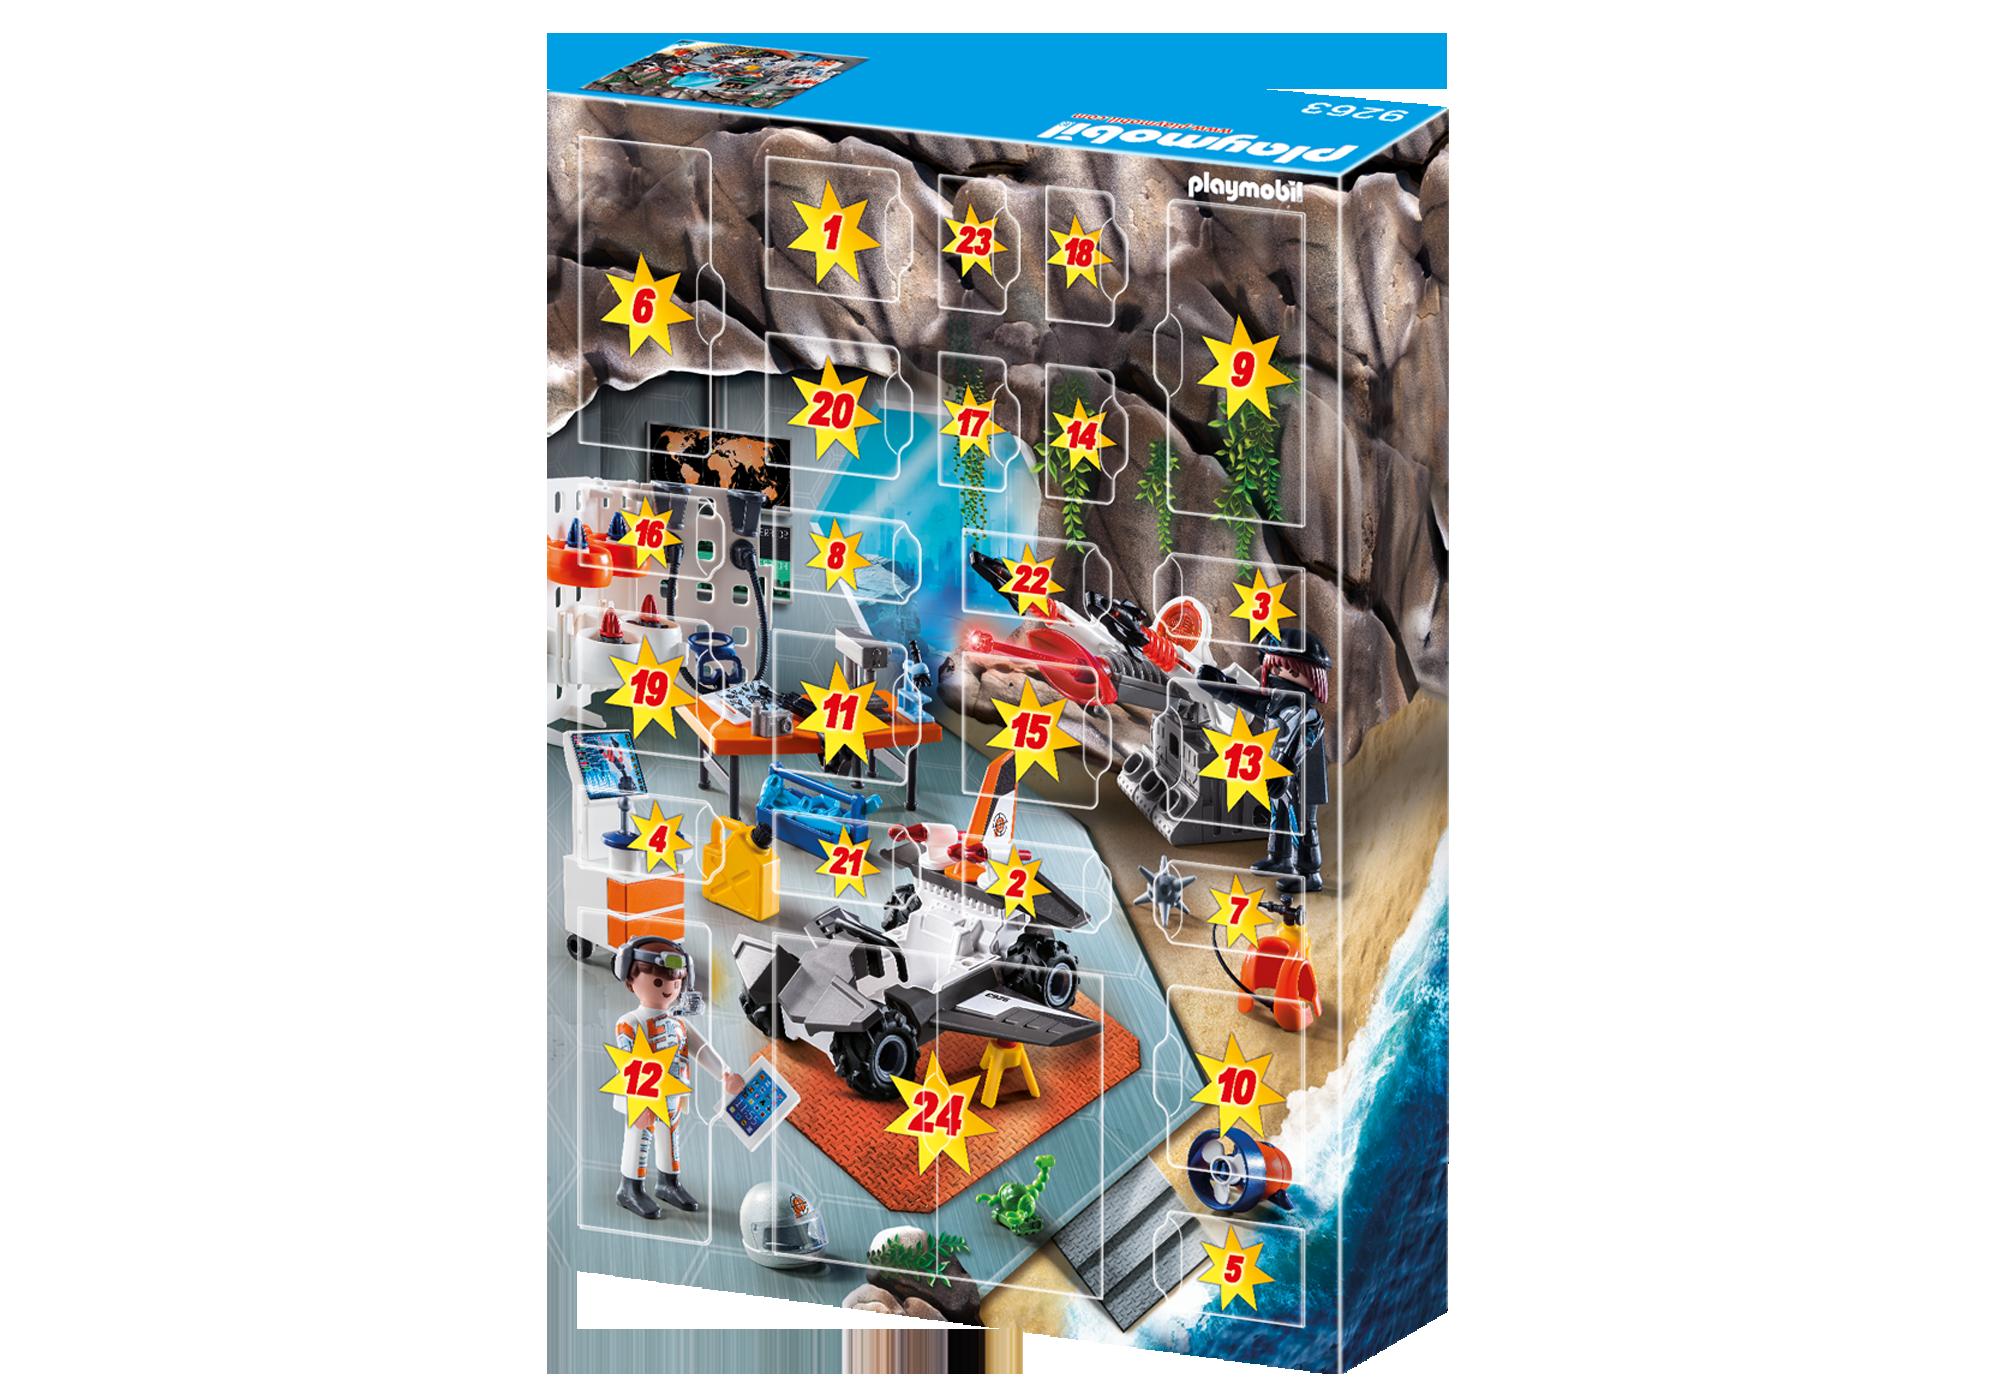 http://media.playmobil.com/i/playmobil/9263_product_extra2